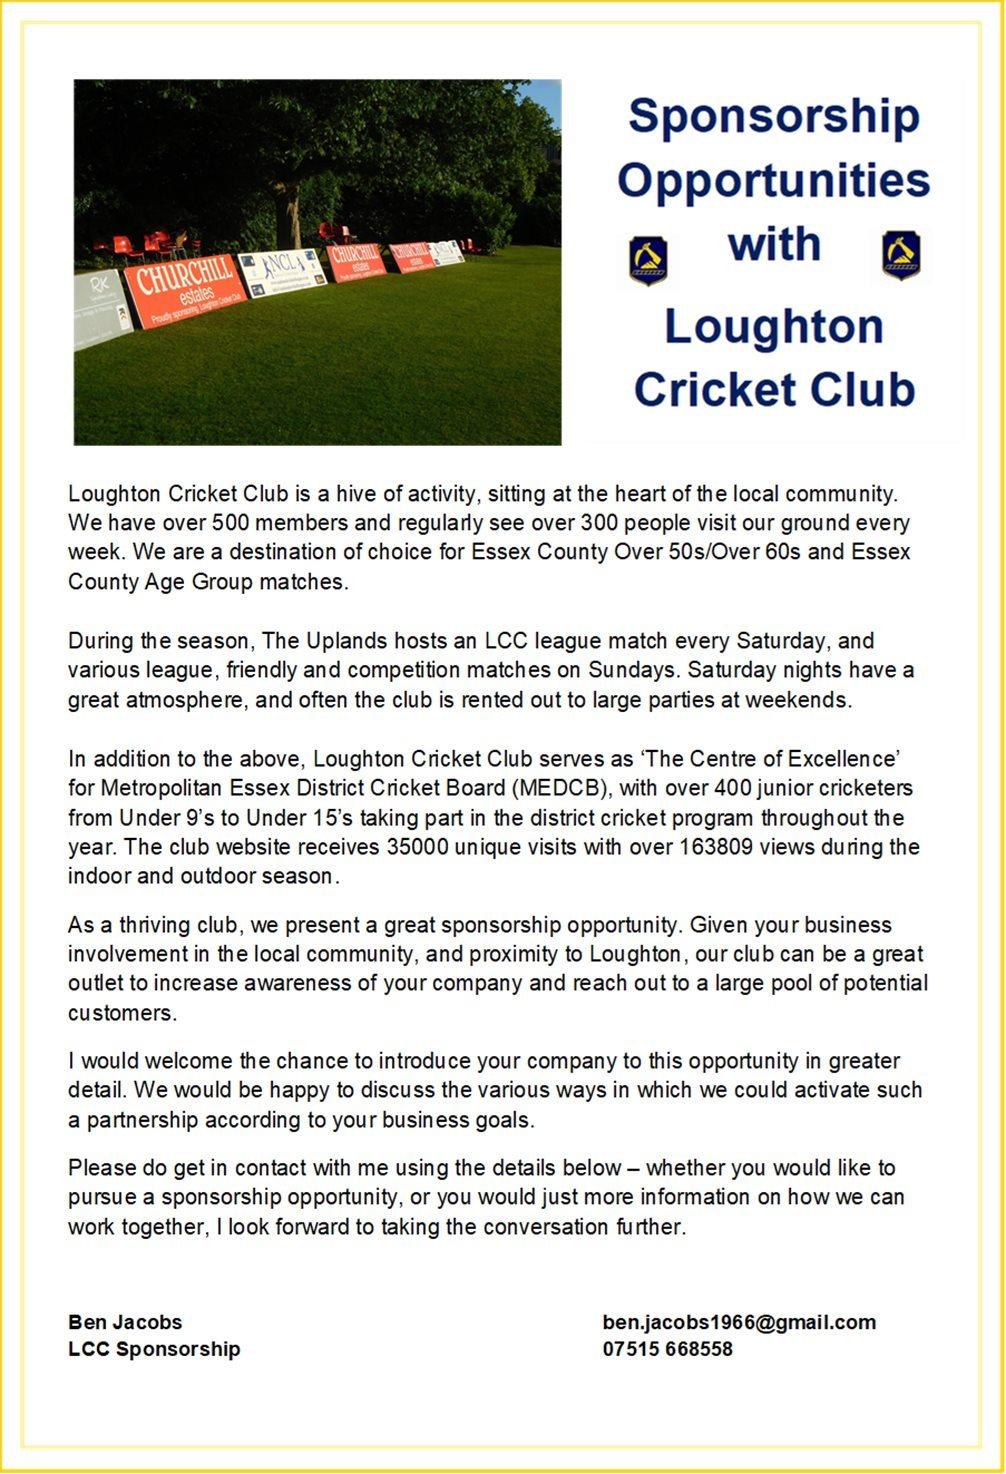 Loughton Cricket Club : SPONSORSHIP